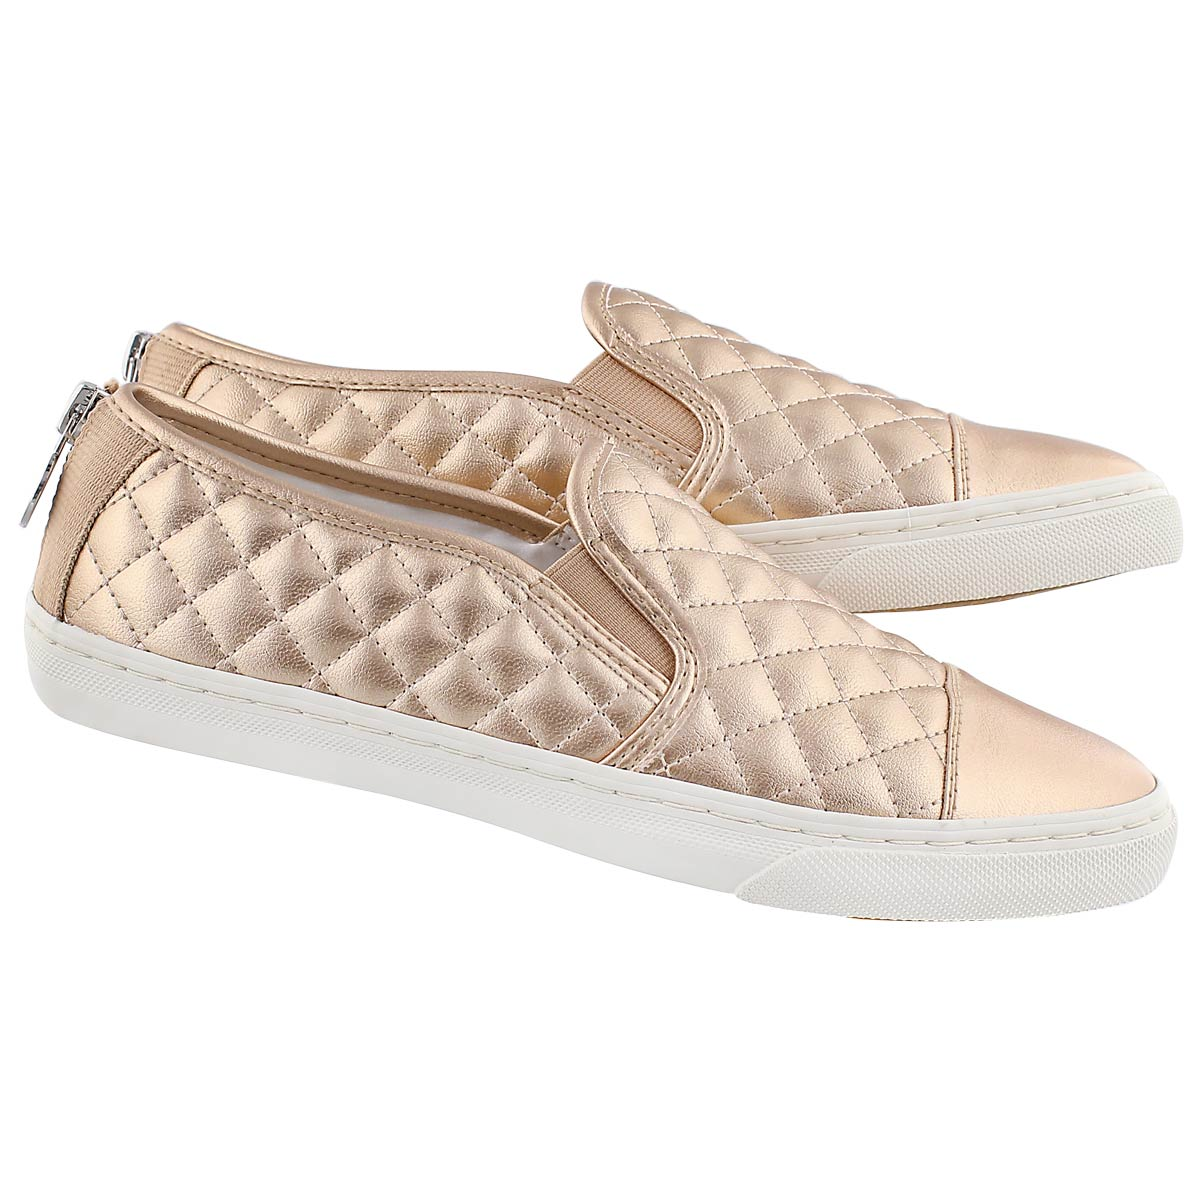 Lds New Club skin slip on sneaker